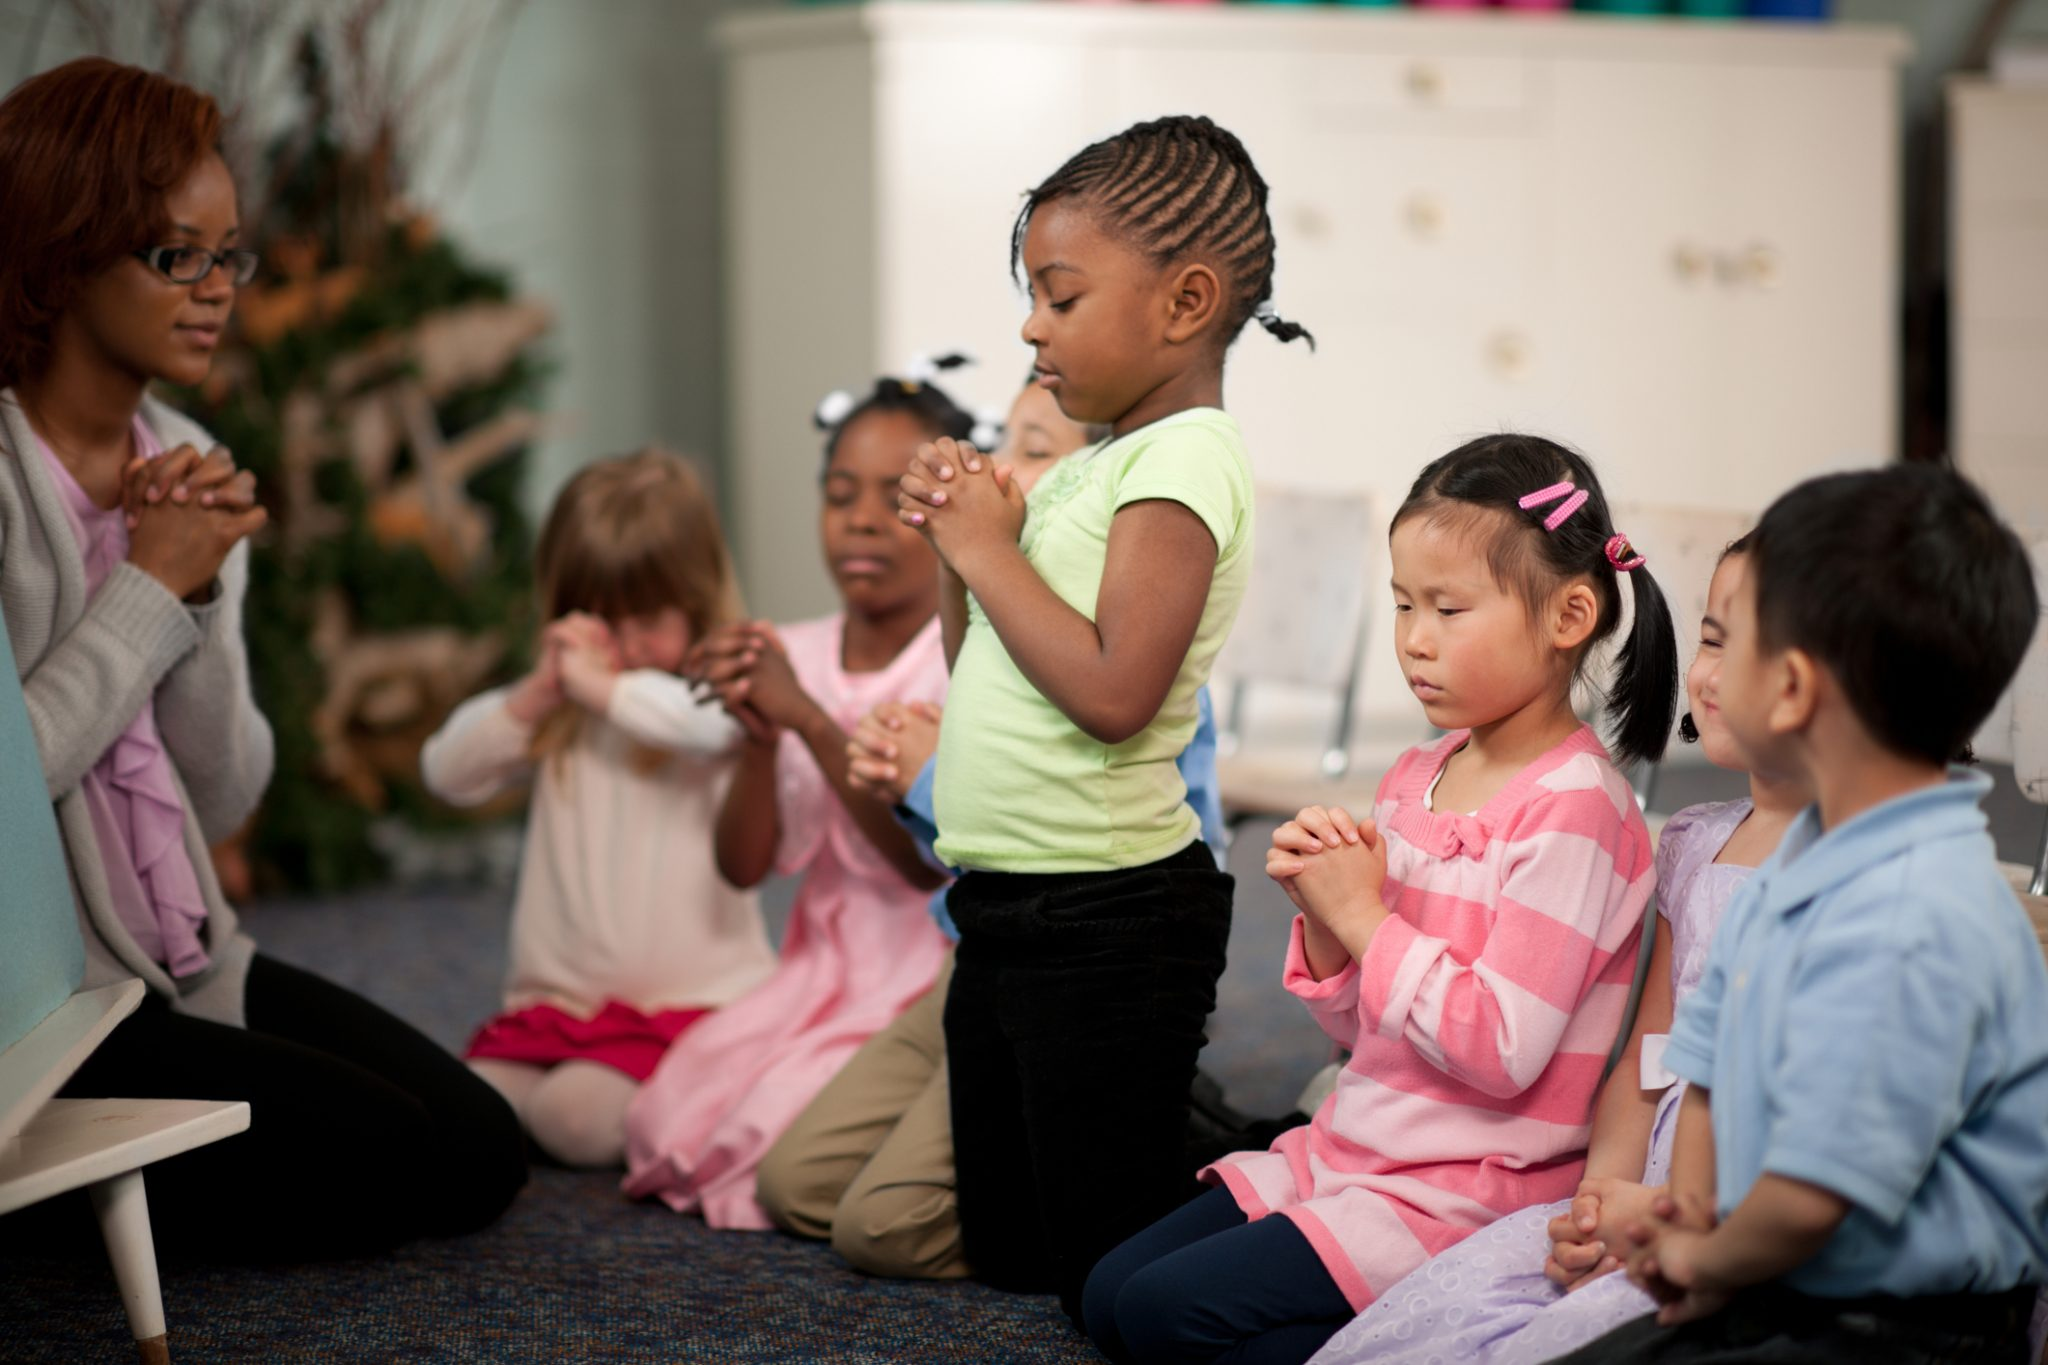 Children In A Religious Program Representing